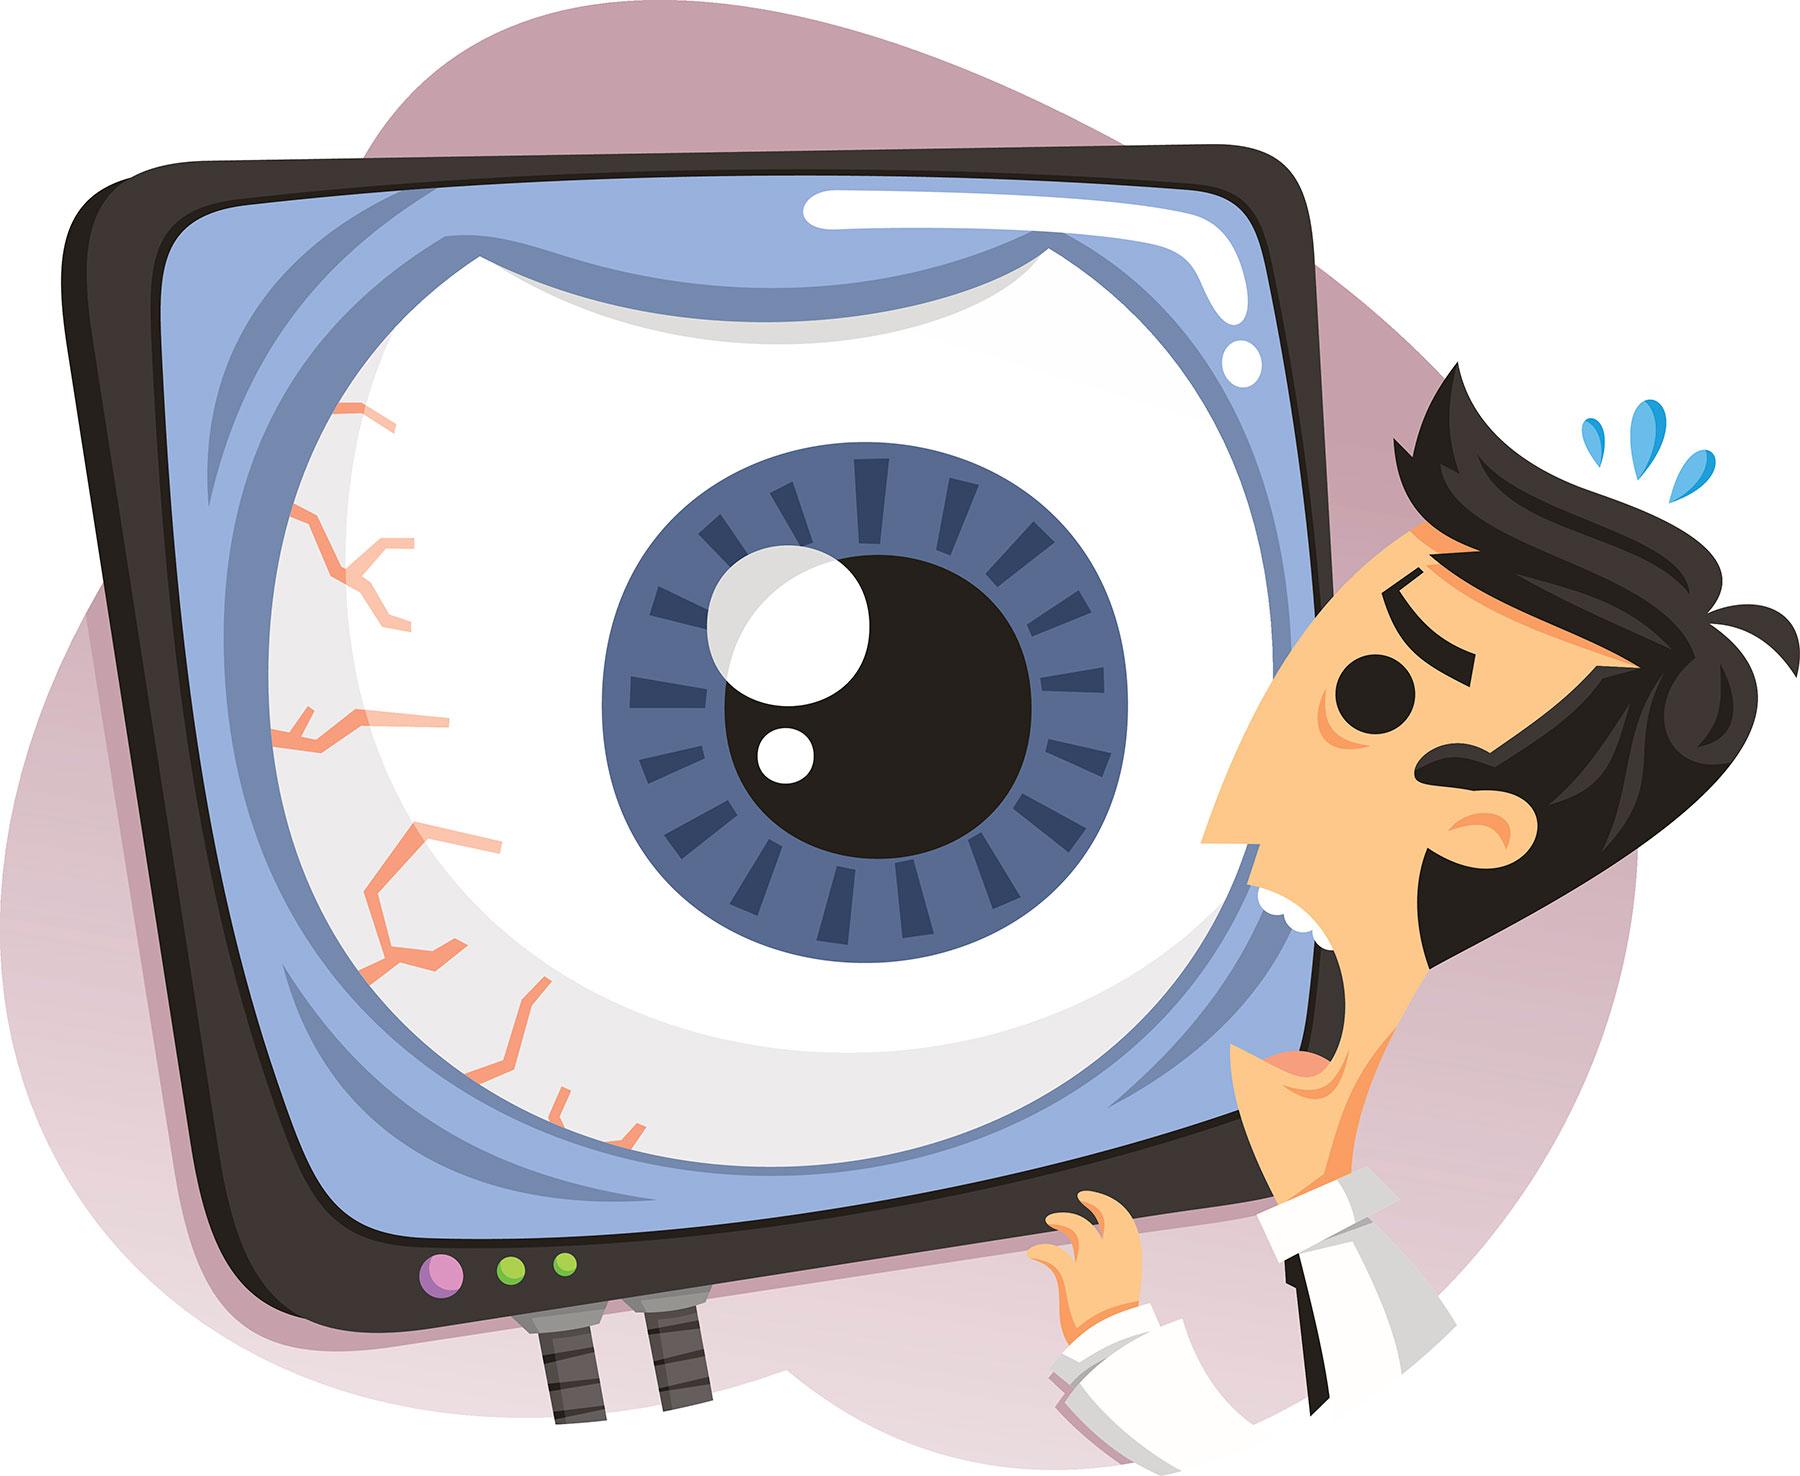 Govt surveillance NSA social